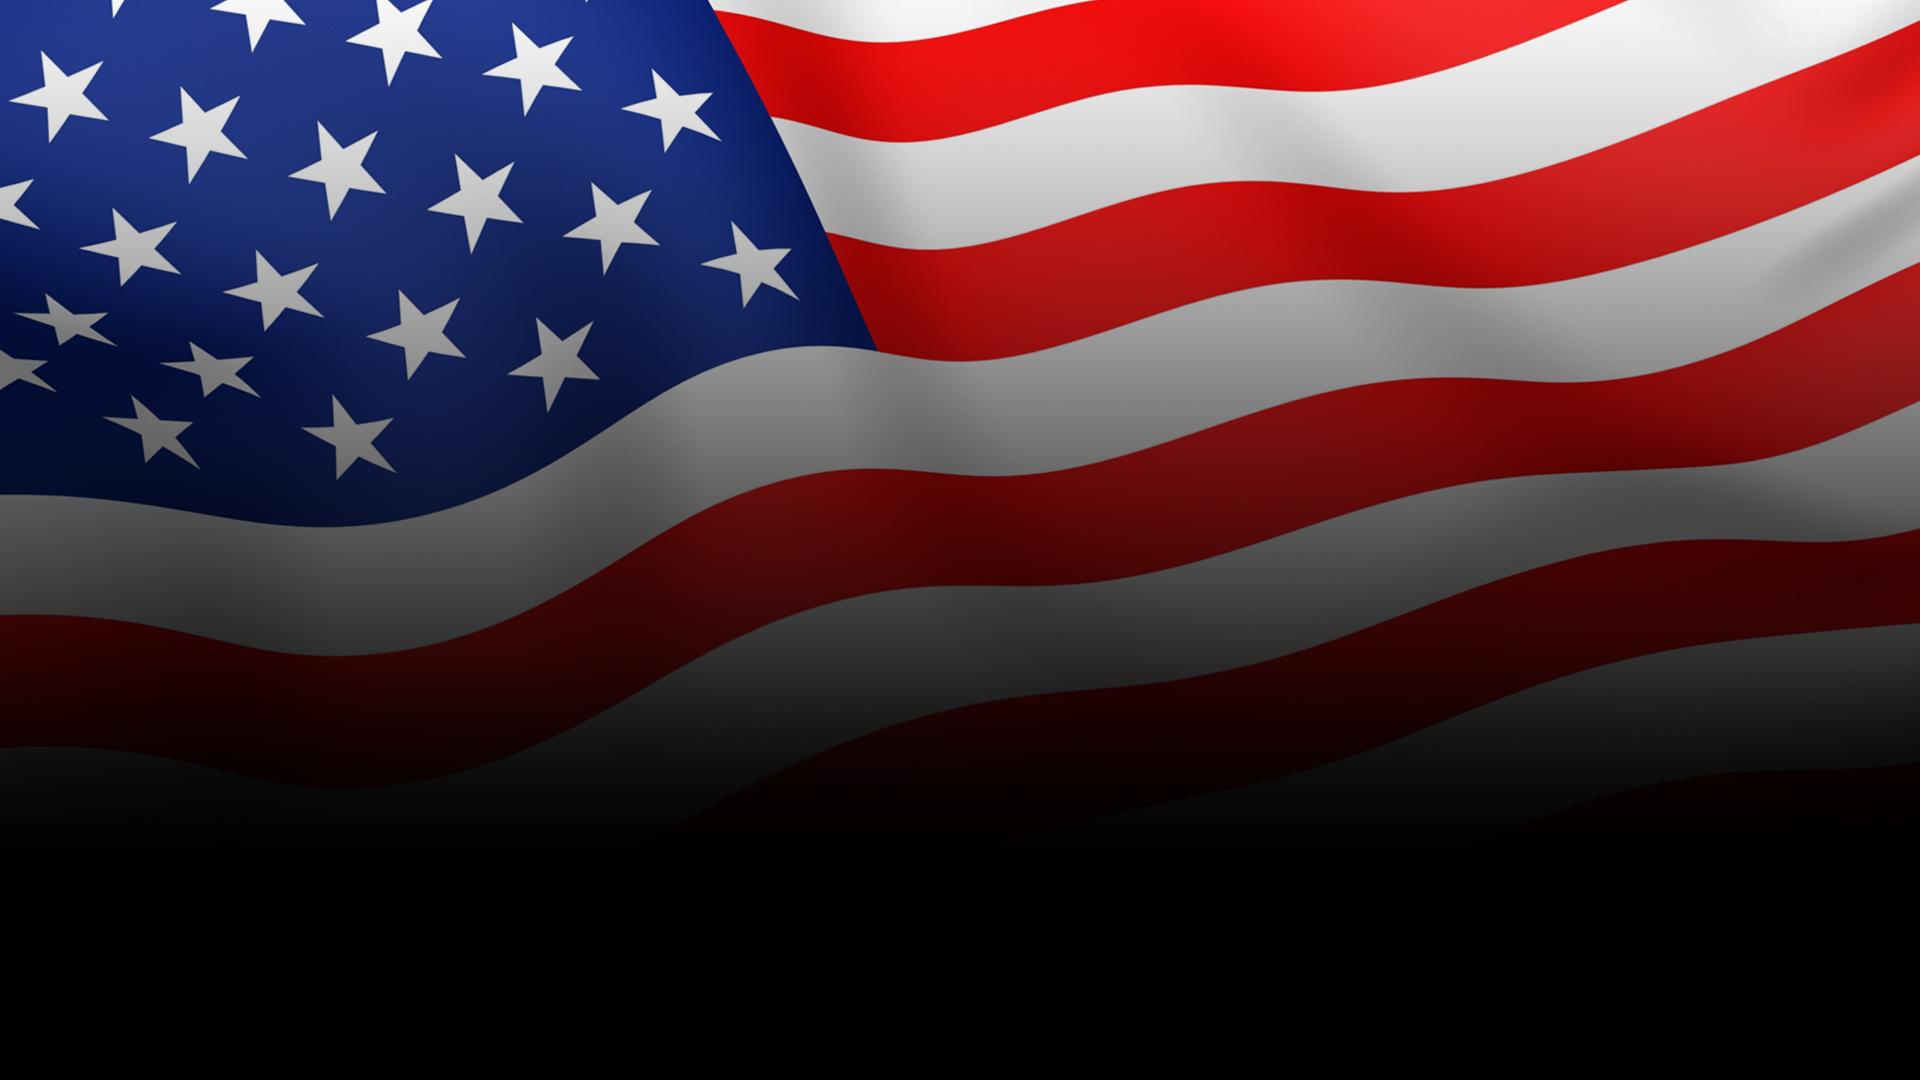 Patriotic Cartoon Classics: 25 All-American Cartoons from World War II